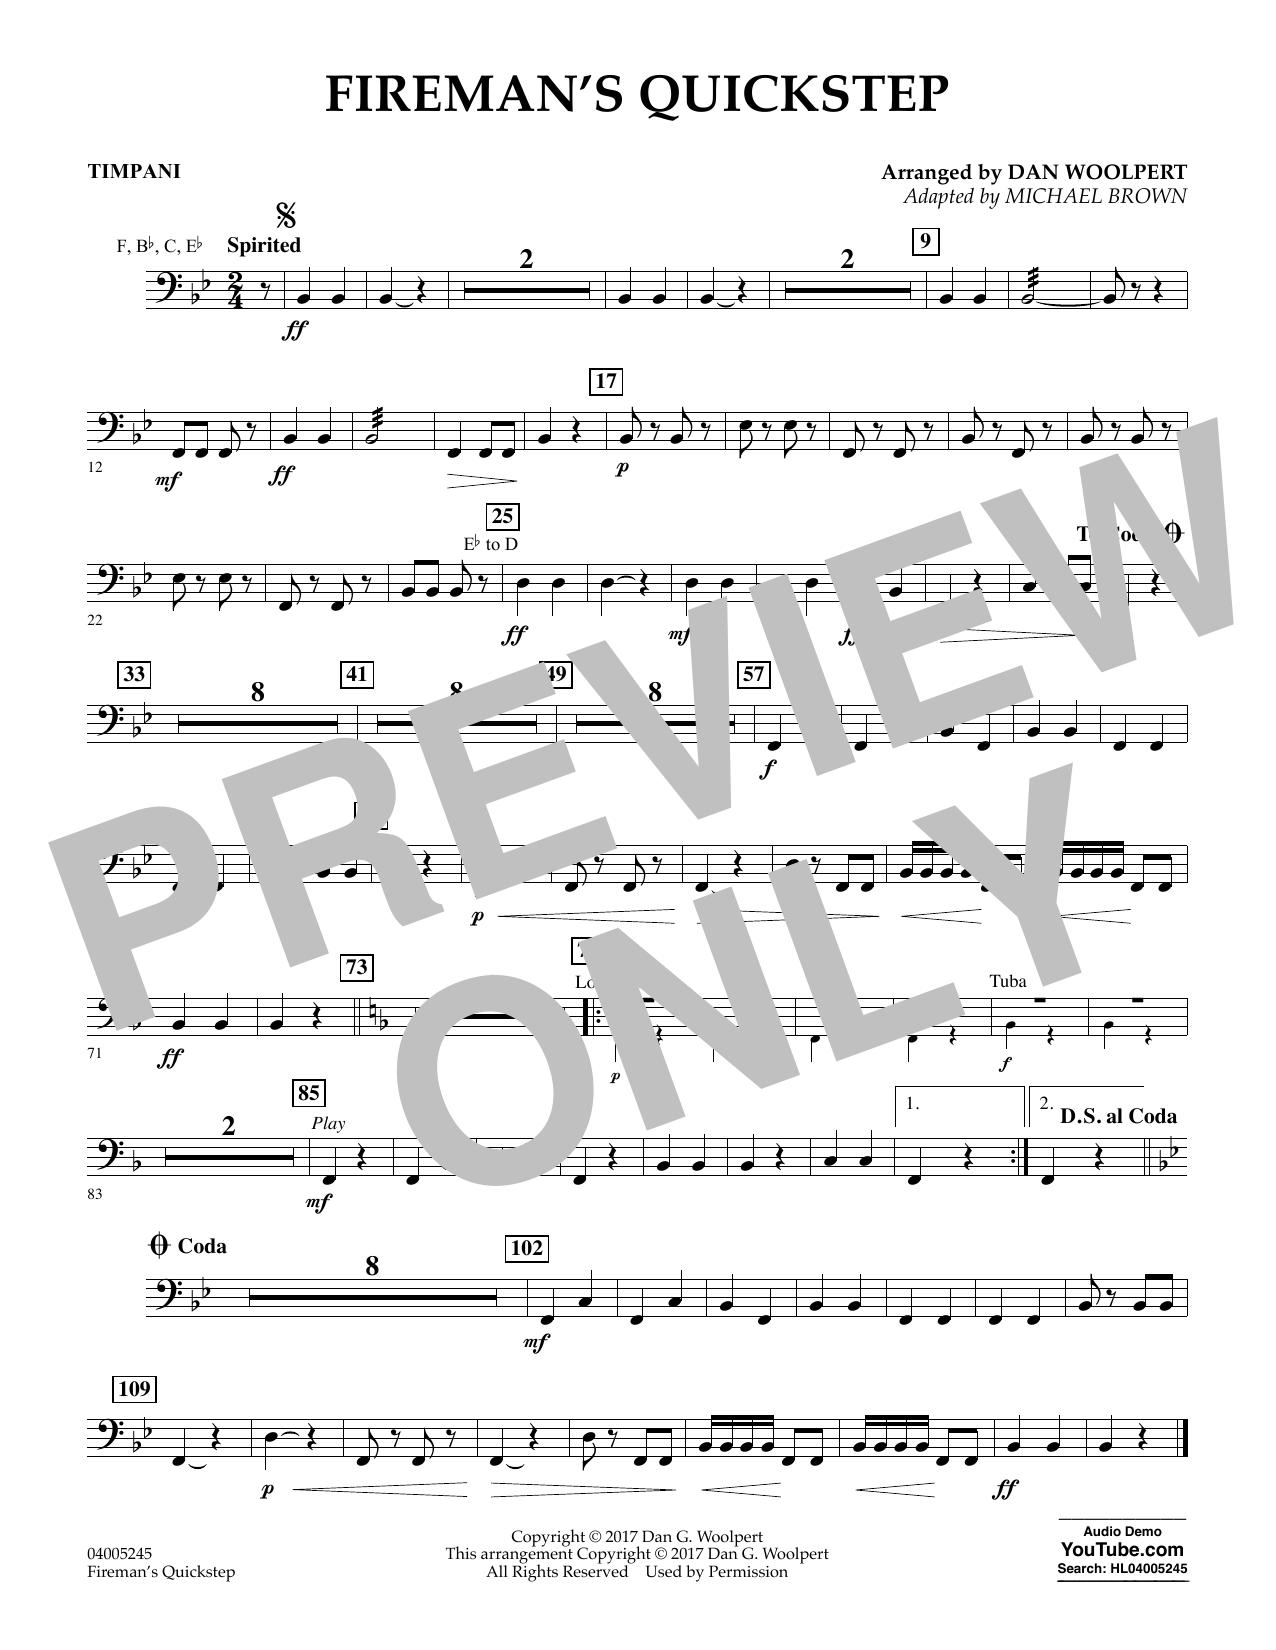 Fireman's Quickstep - Timpani (Concert Band)